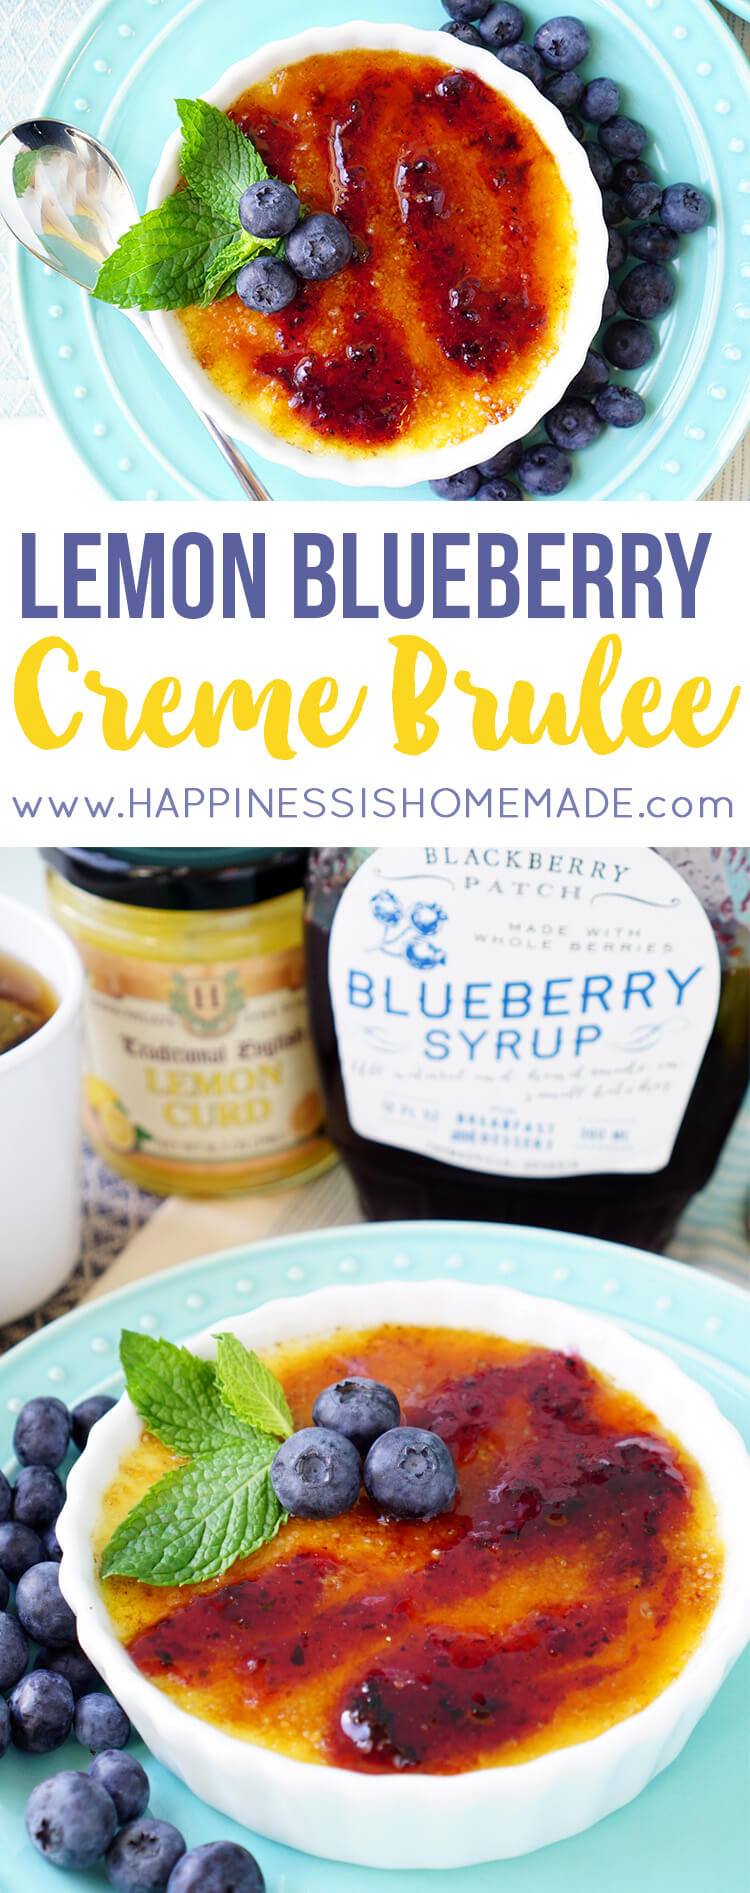 Lemon Blueberry Creme Brulee Recipe